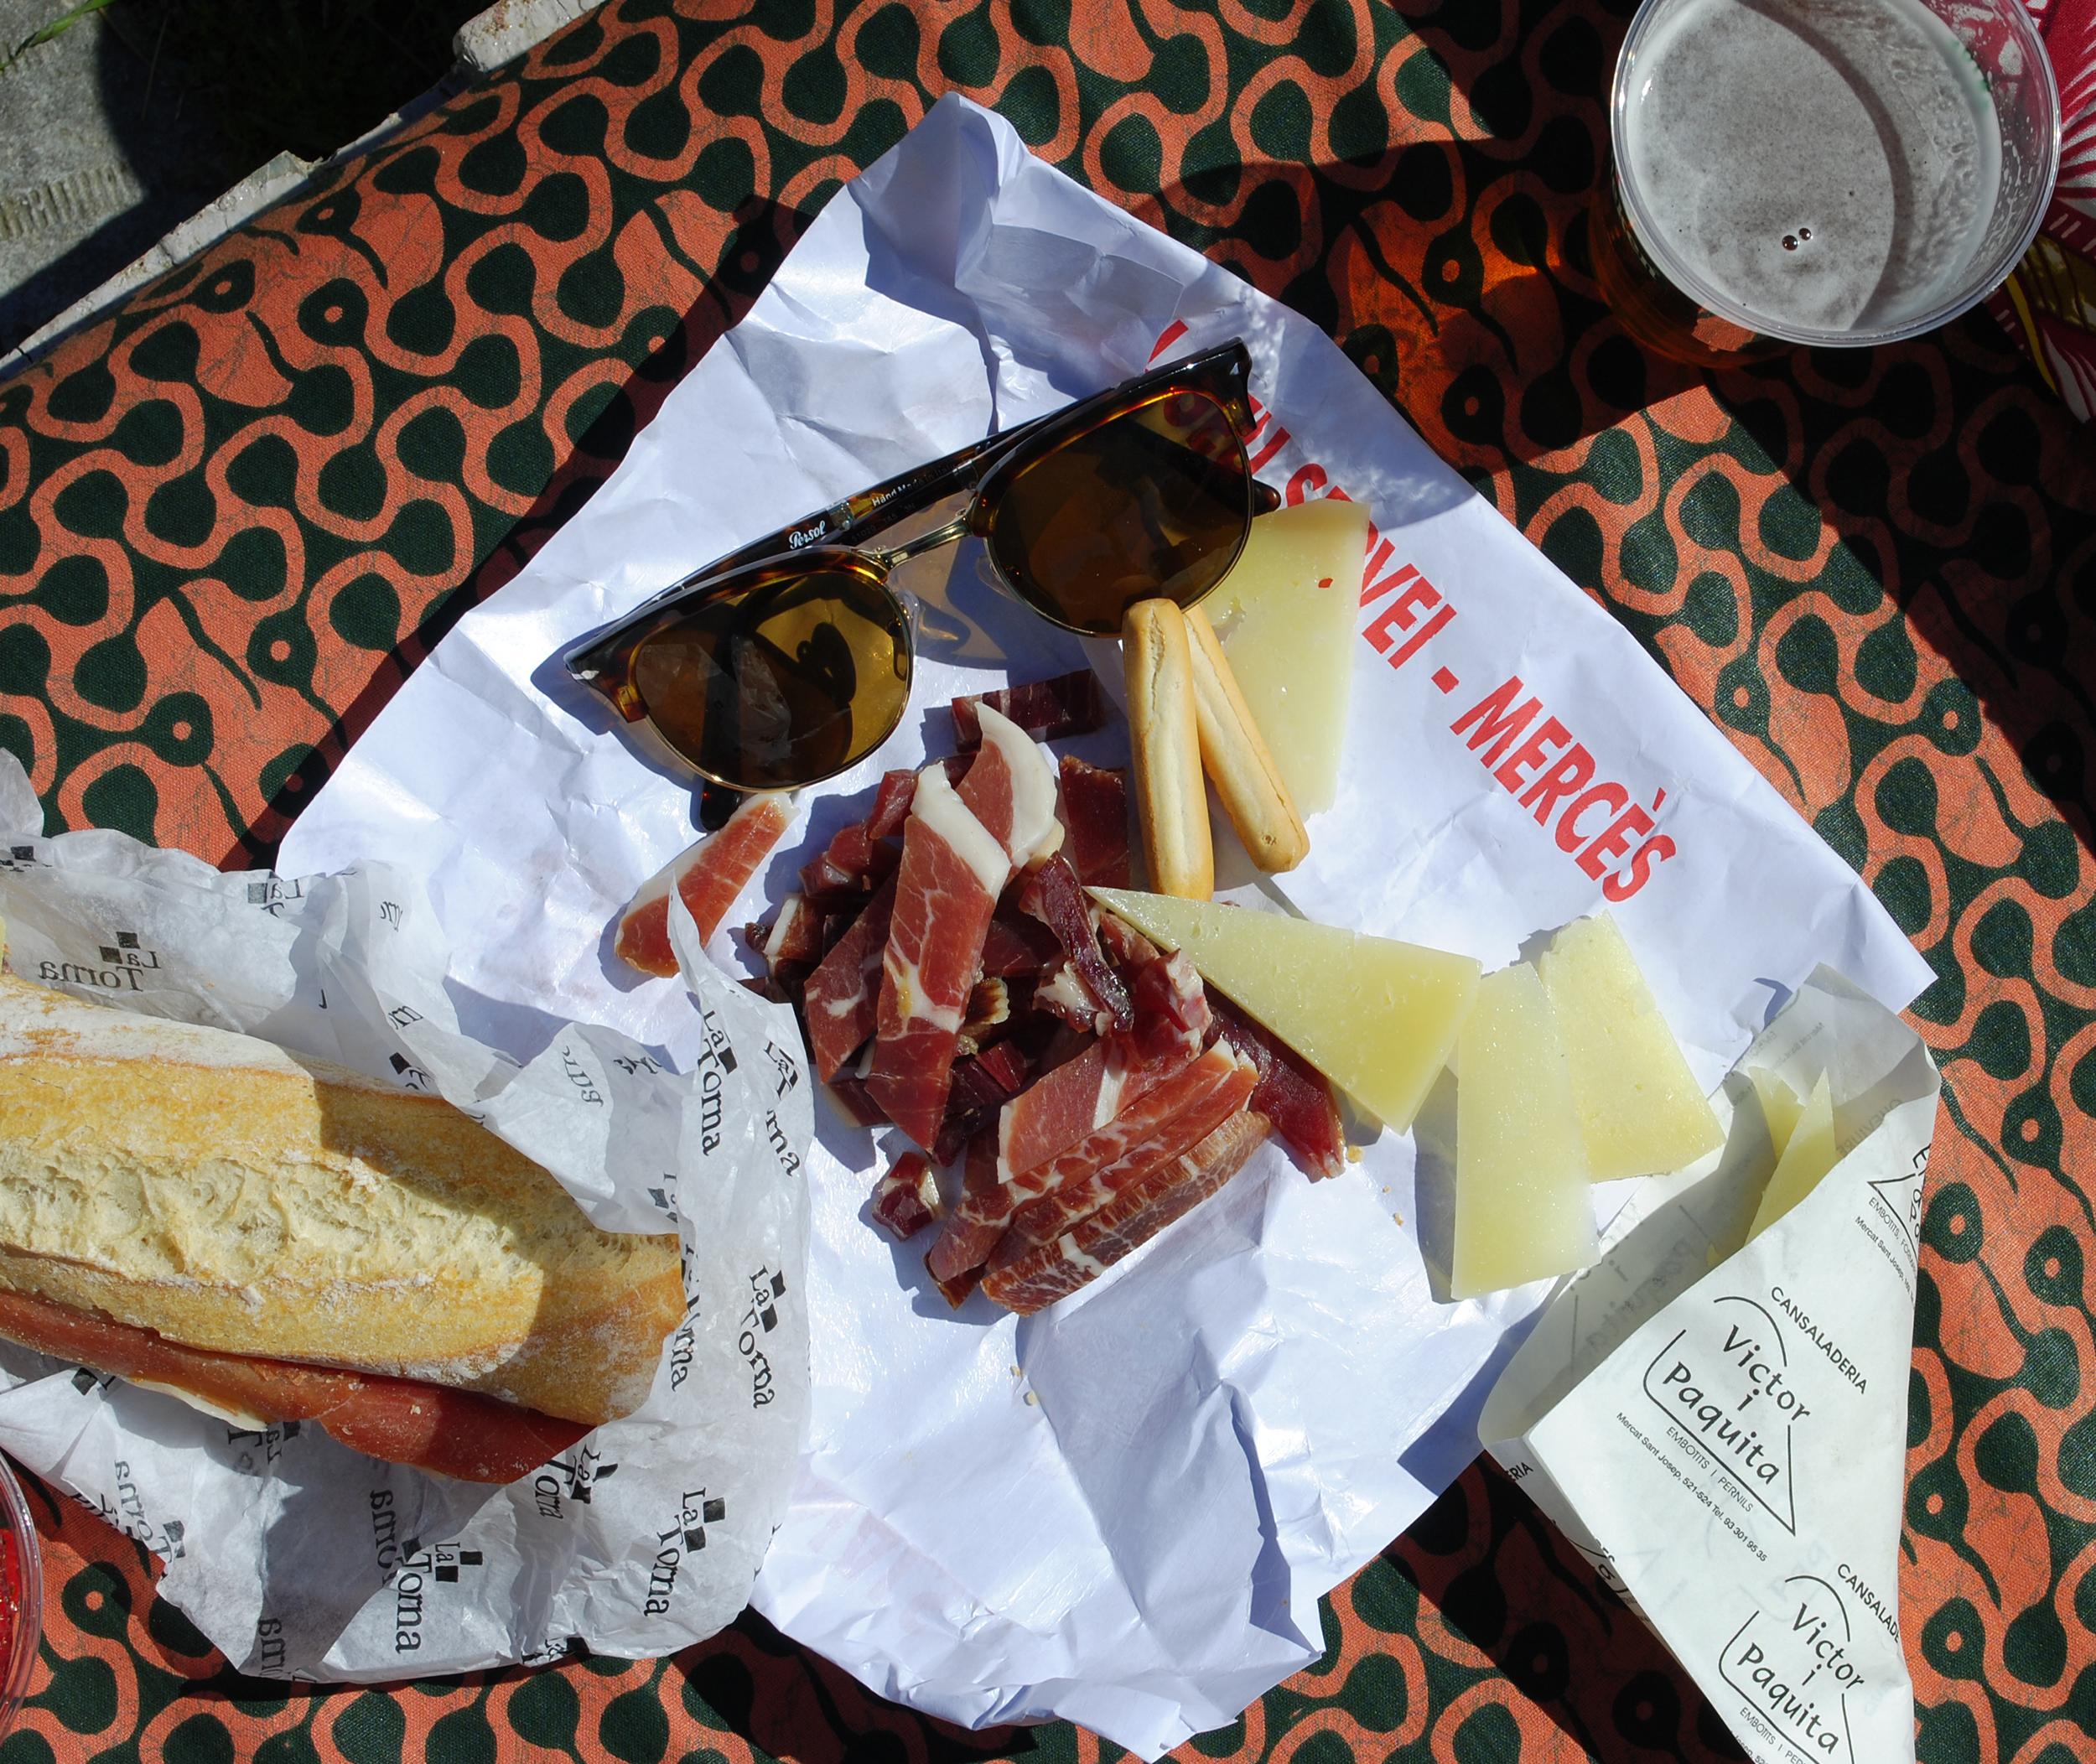 Our mountaintop picnic